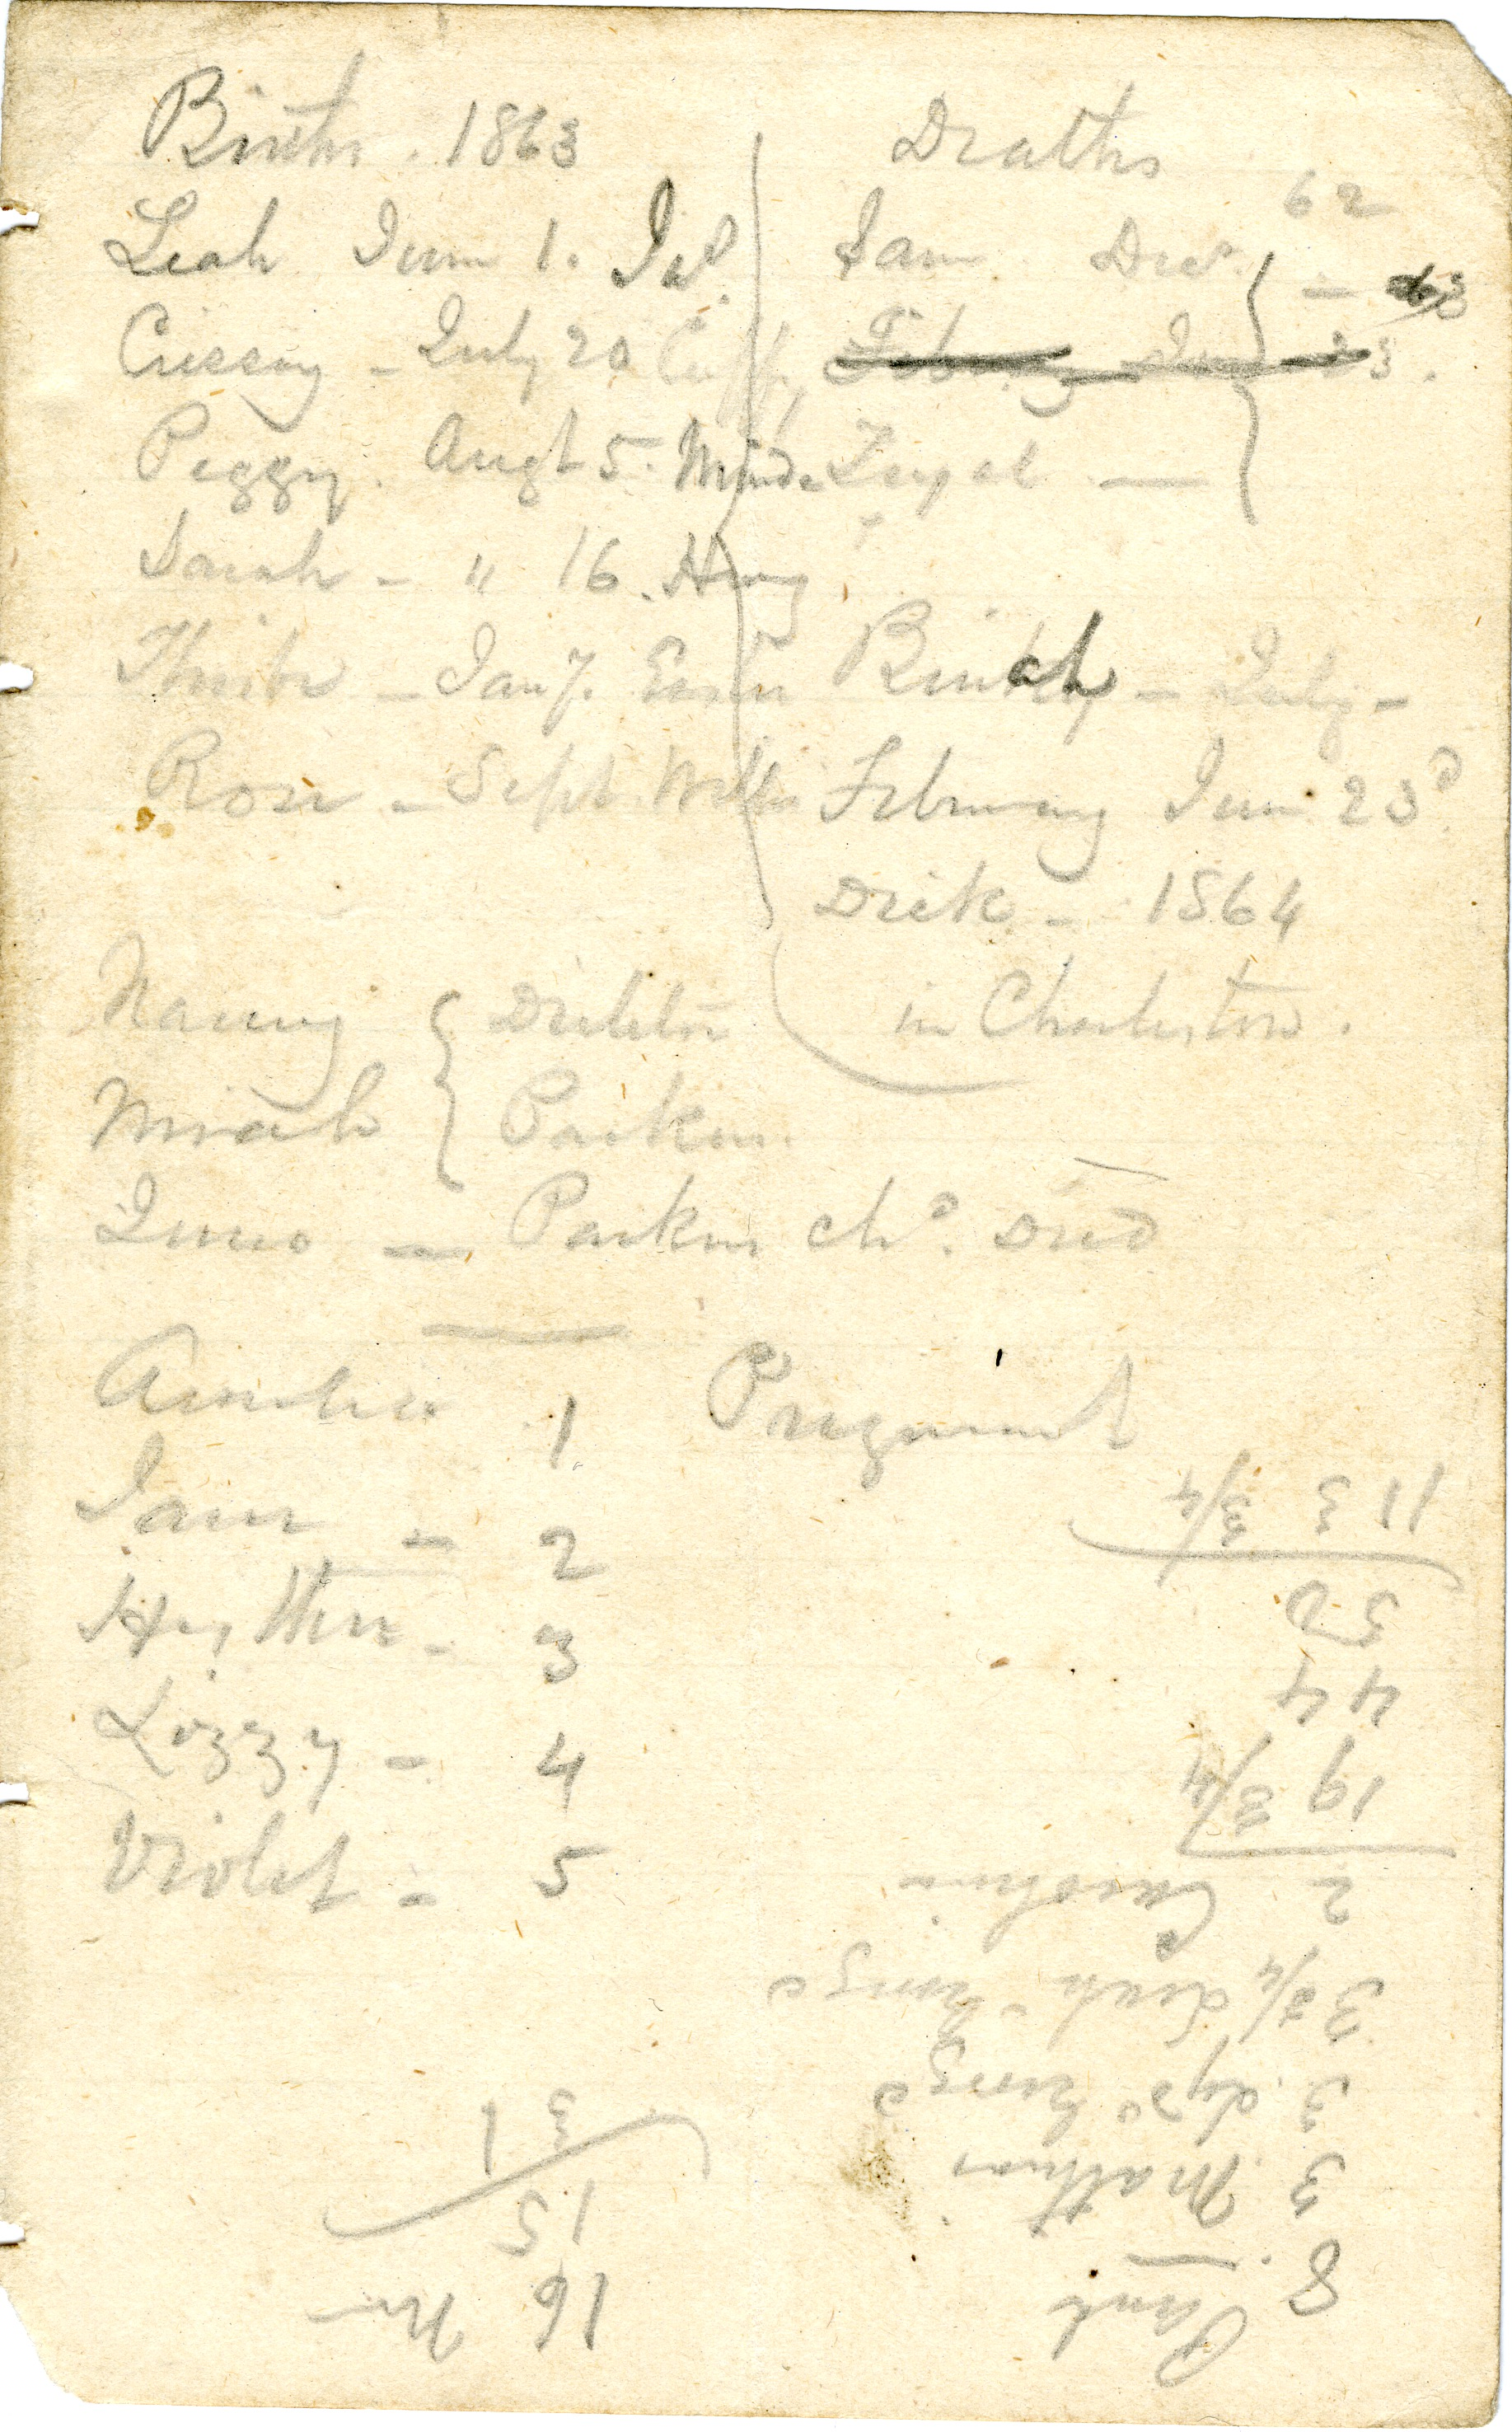 Dirleton Plantation Memorandum Book, Page 4